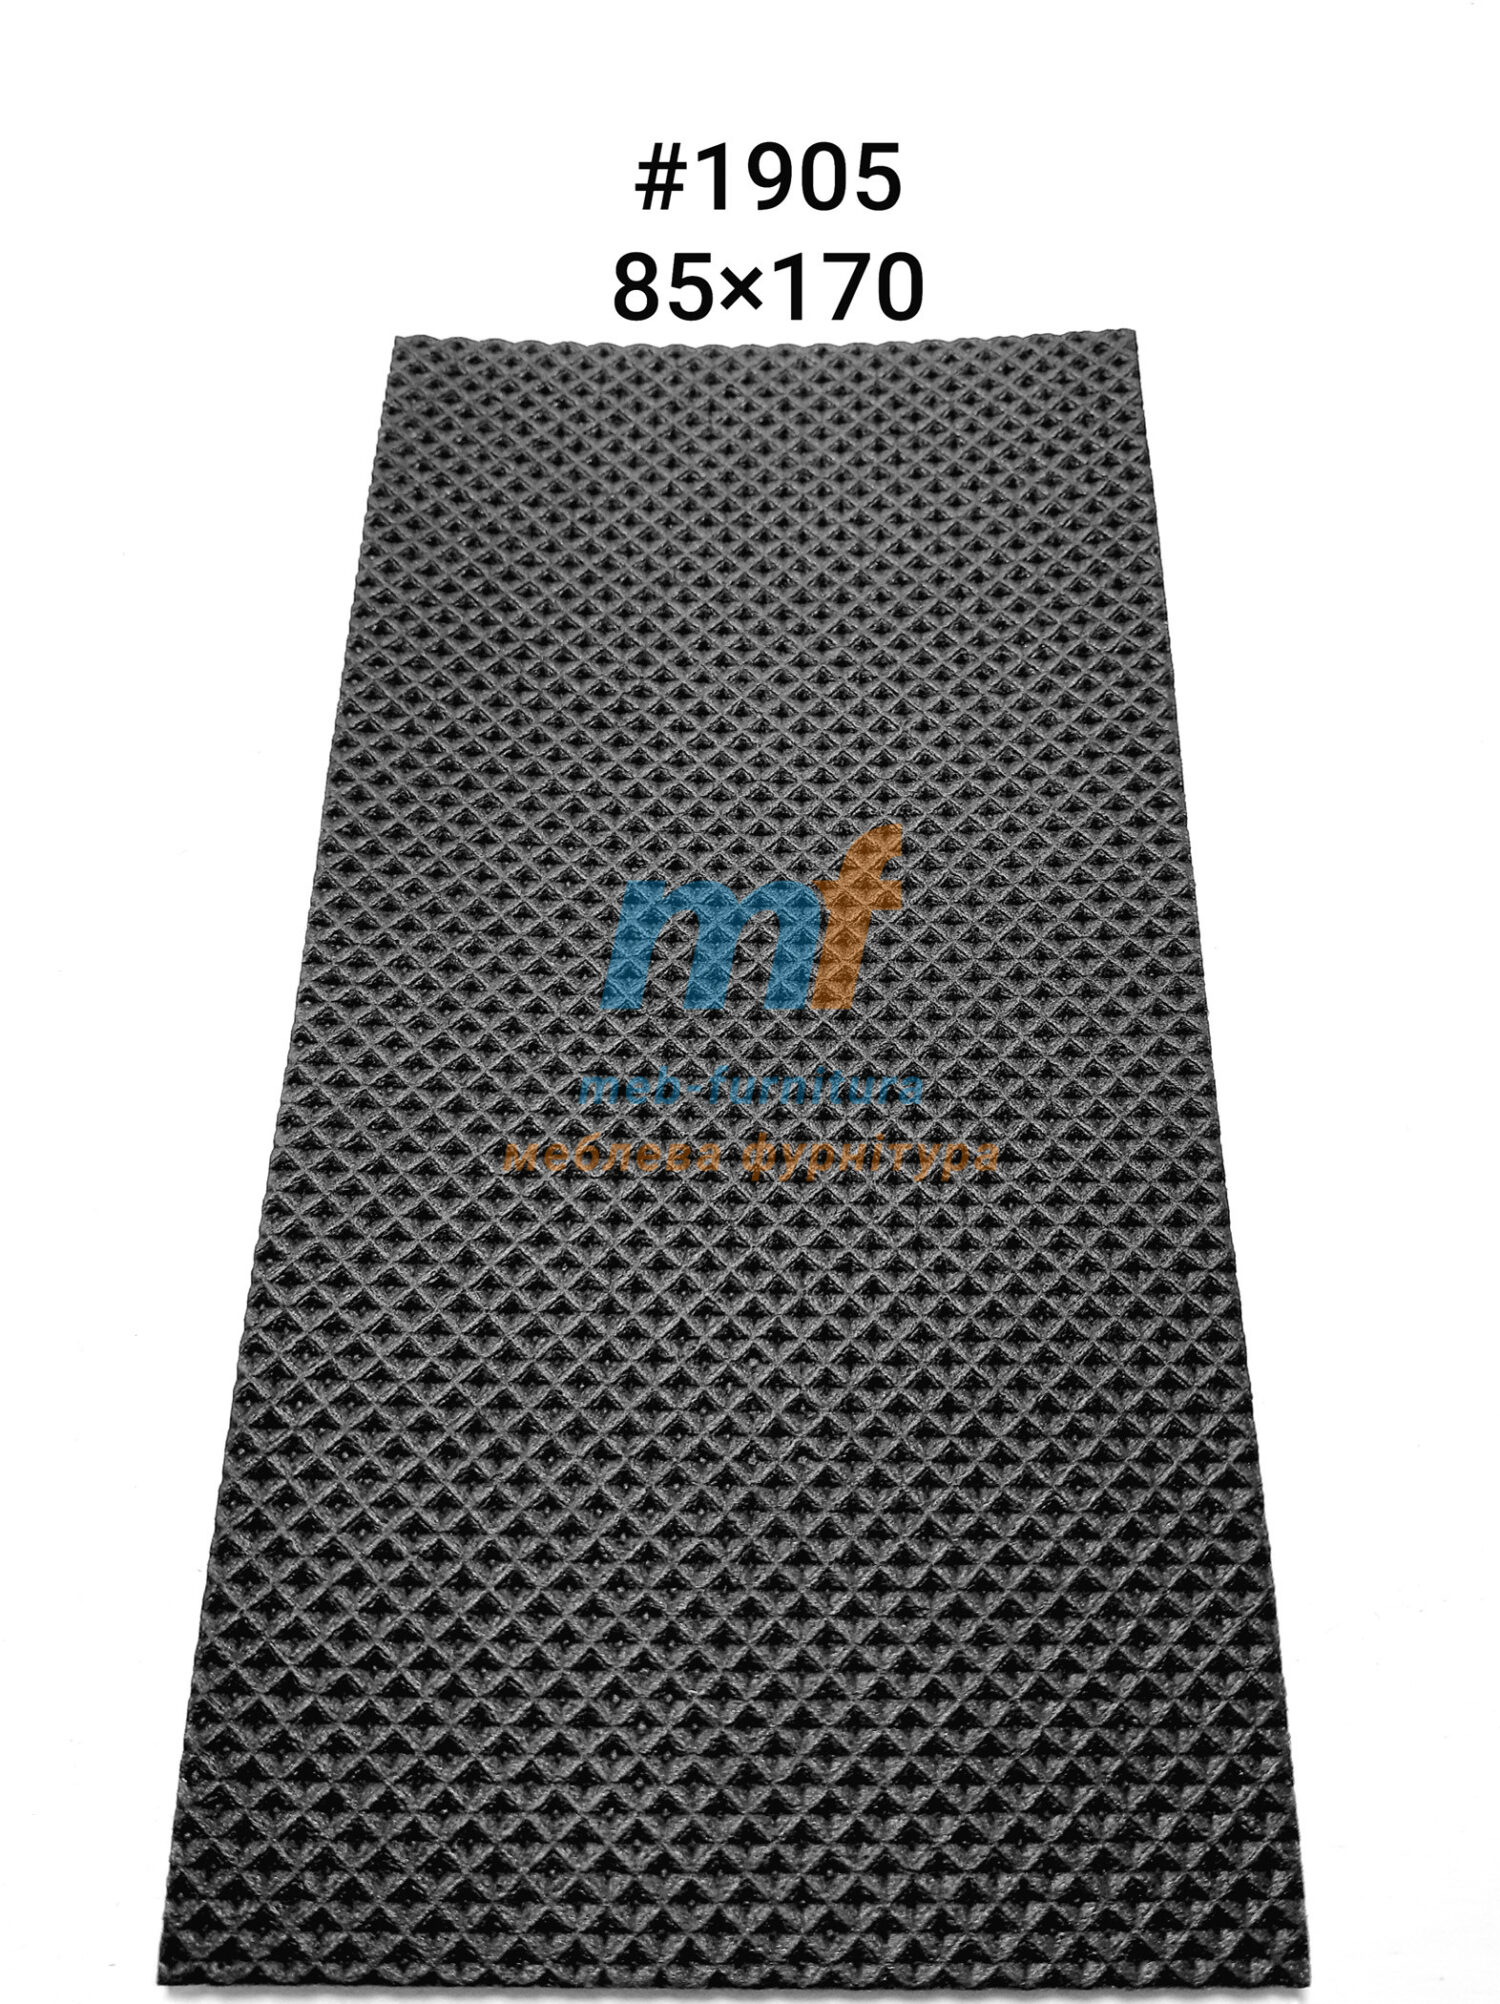 Резиновые накладки на ножки мебели 8.5х17см